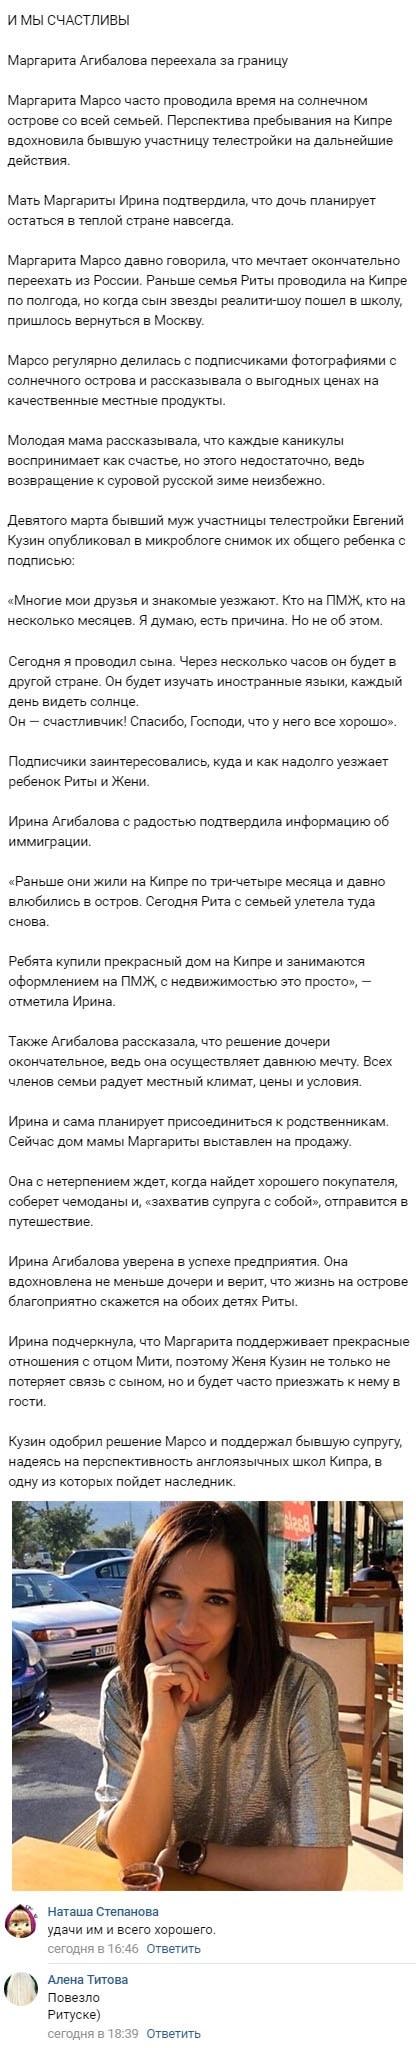 Маргарита Агибалова уехала заграницу на ПМЖ